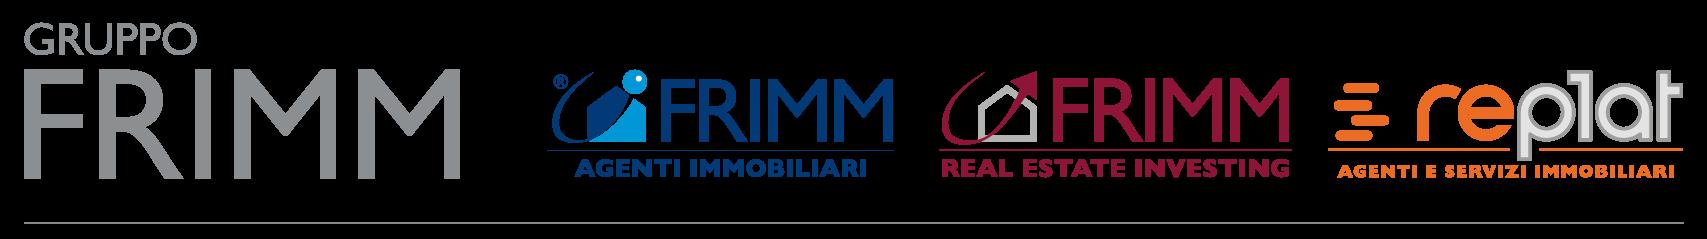 News dal Gruppo FRIMM